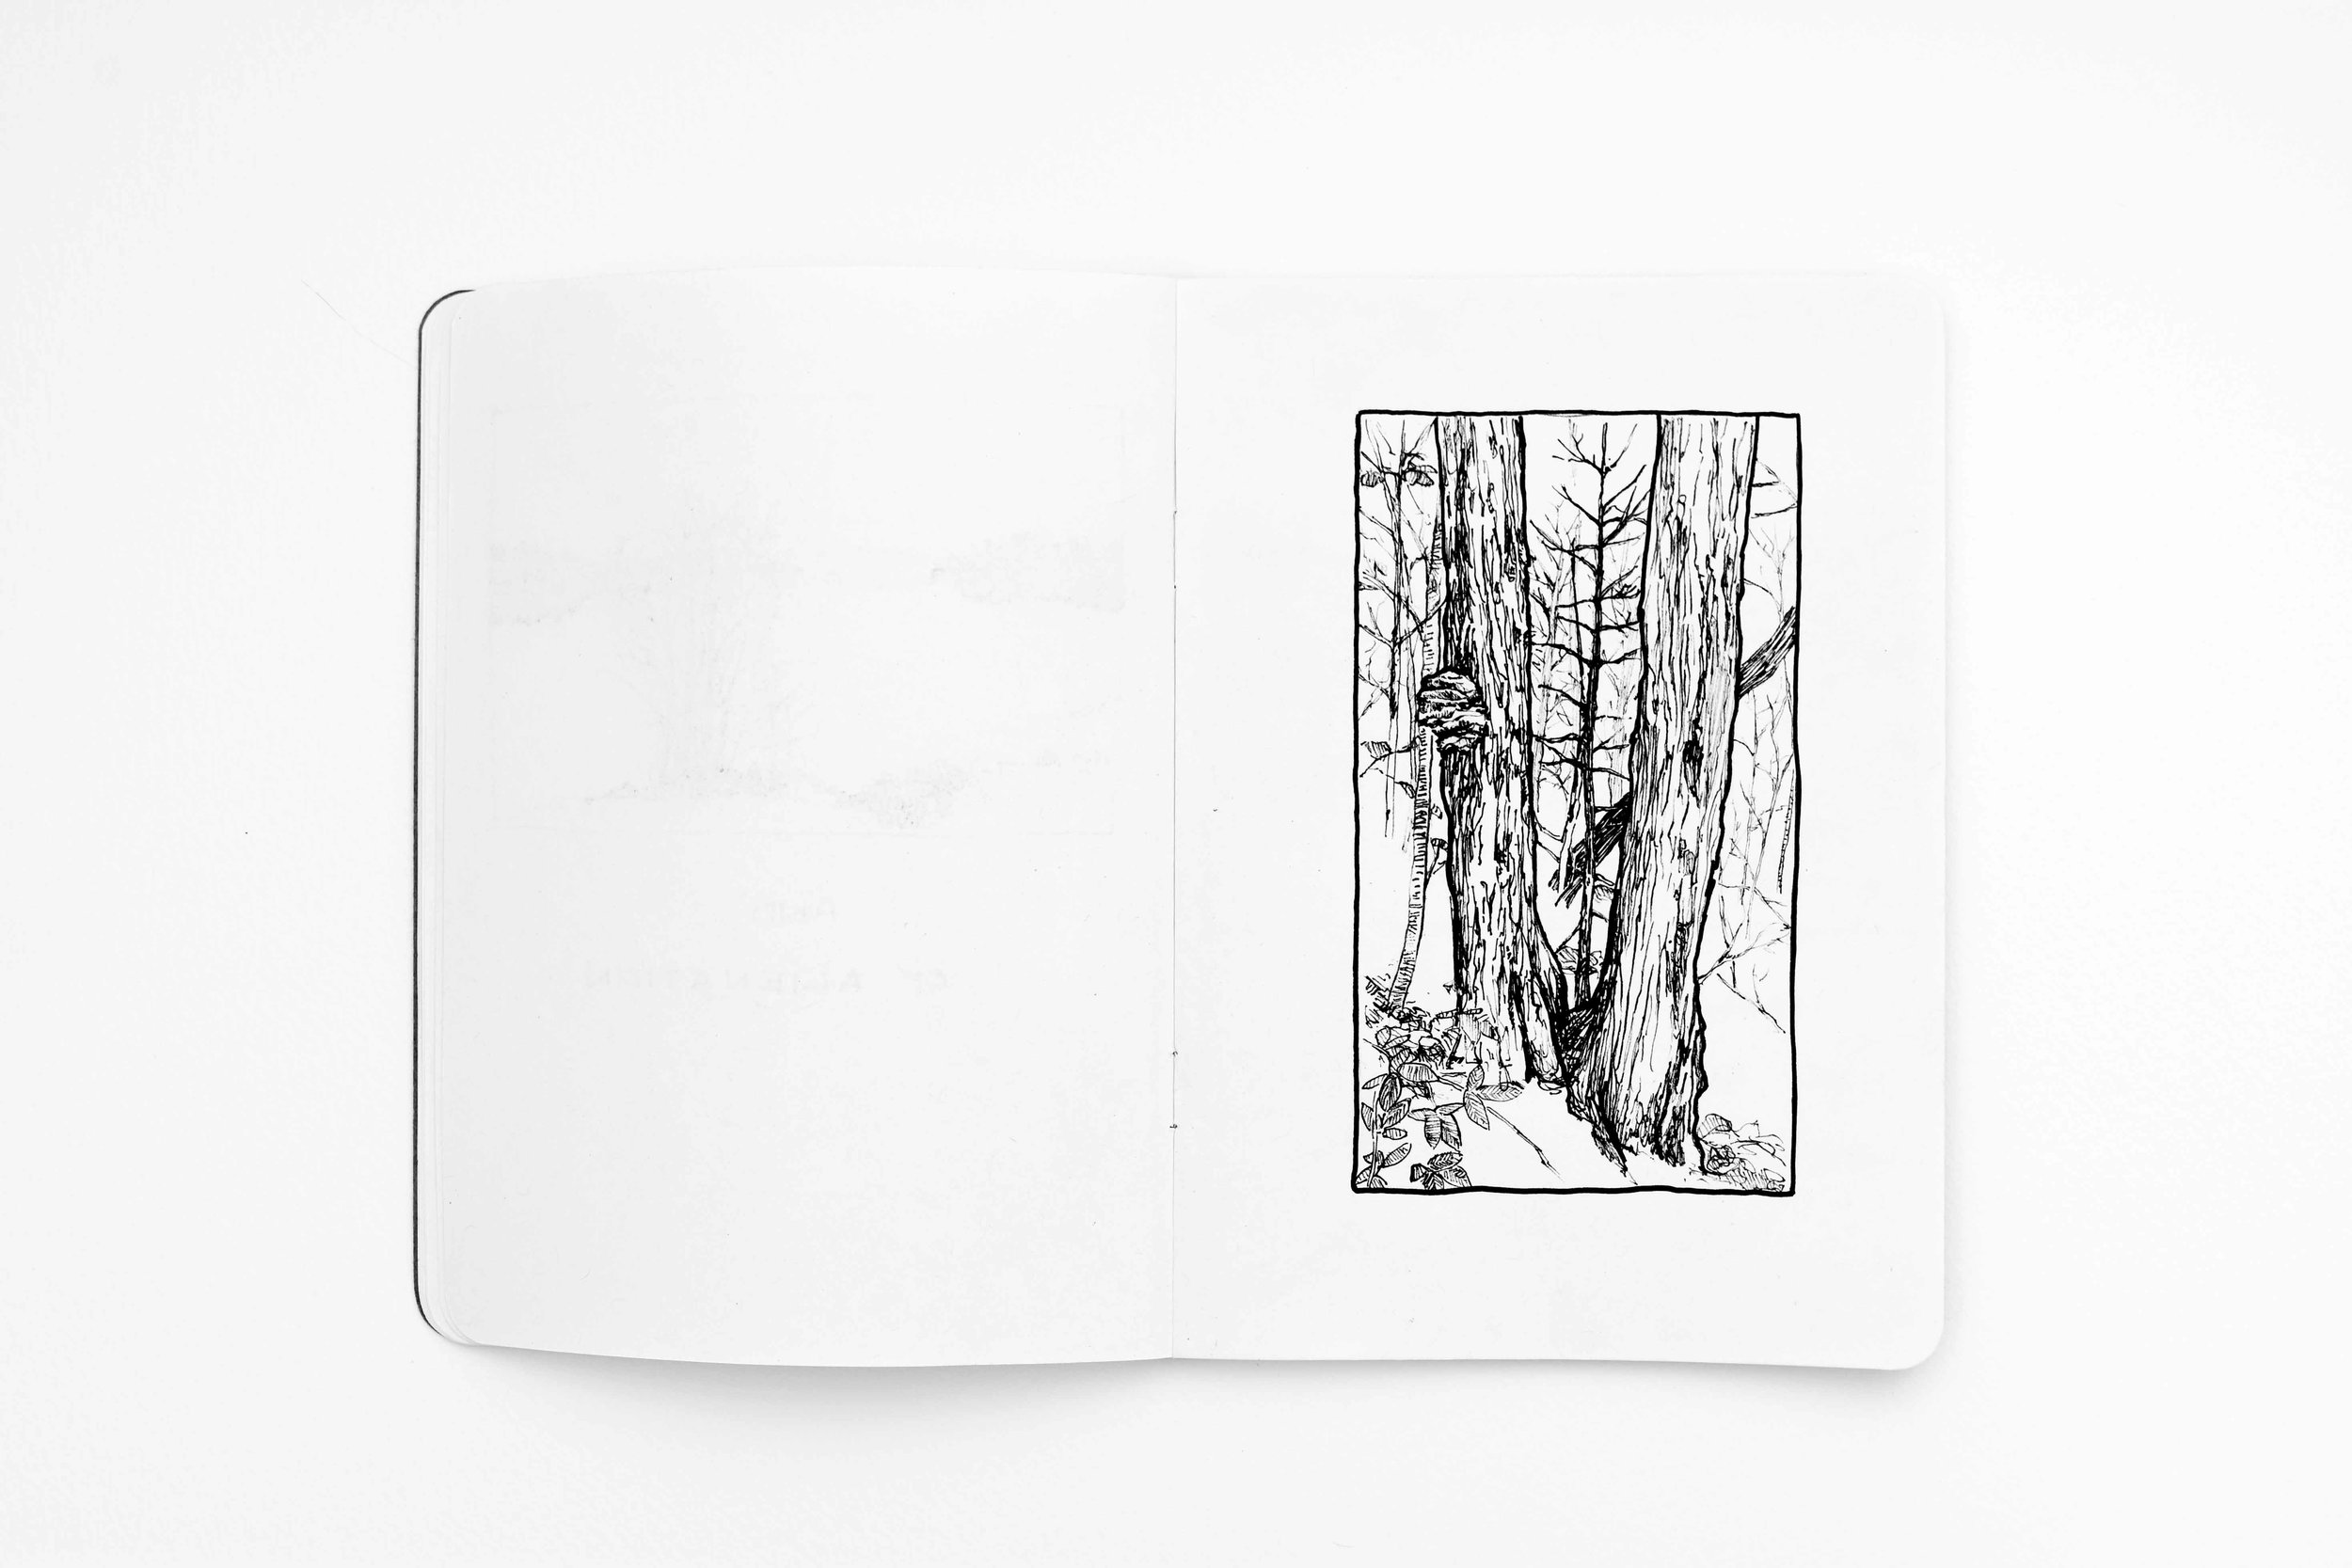 tiffany-moore-sketchbook-landscape (6 of 13).jpg